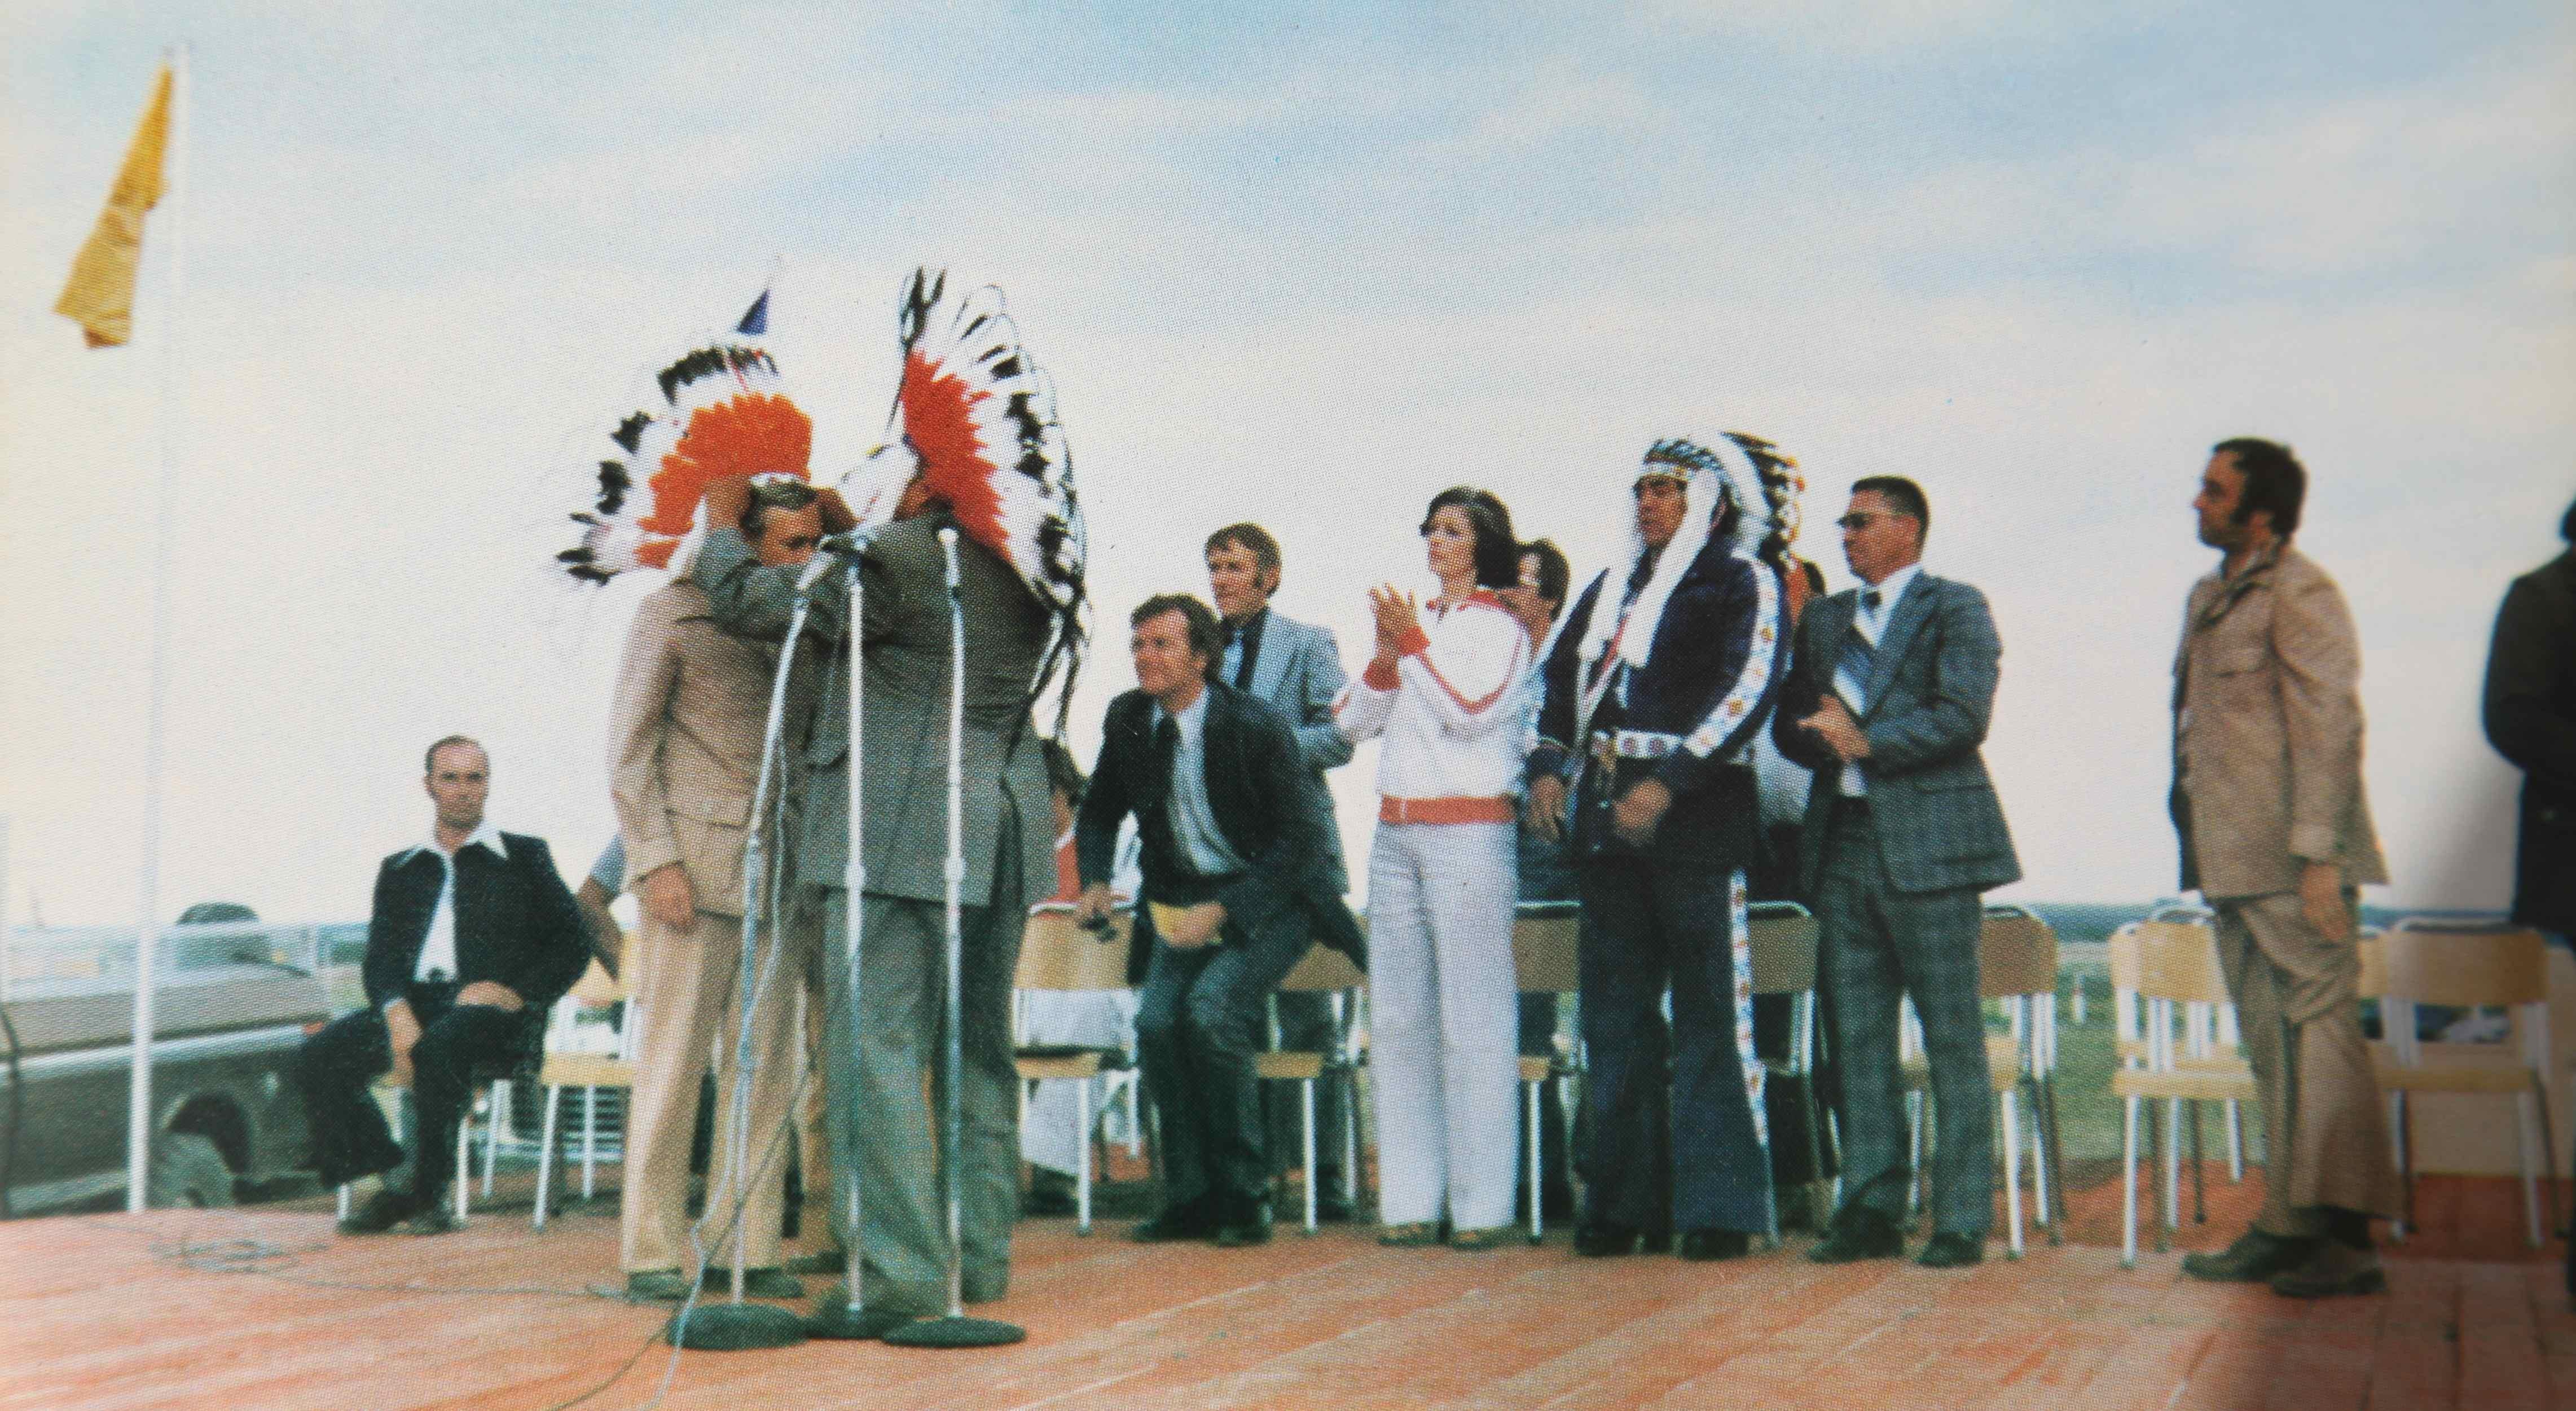 Premier Allan Blakeney receives Chiefs' Head-dress from Elder Adam Stevenson at the Saskatchewan Indian Summer Games, Cote Reserve, 1977.